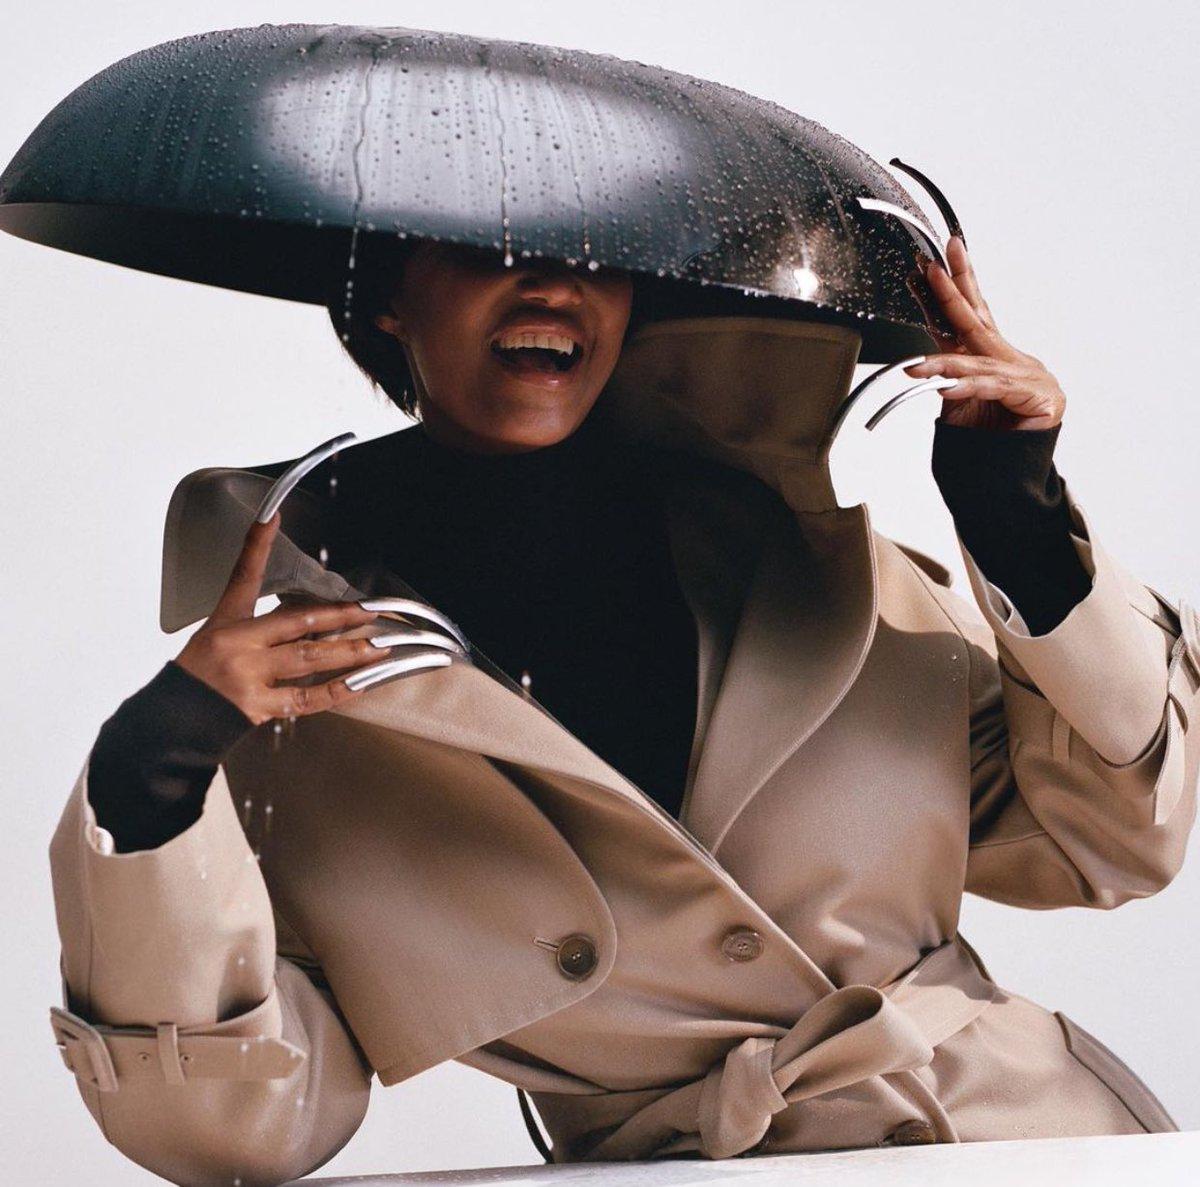 Iman for Interview Magazine wearing Balenciaga Couture